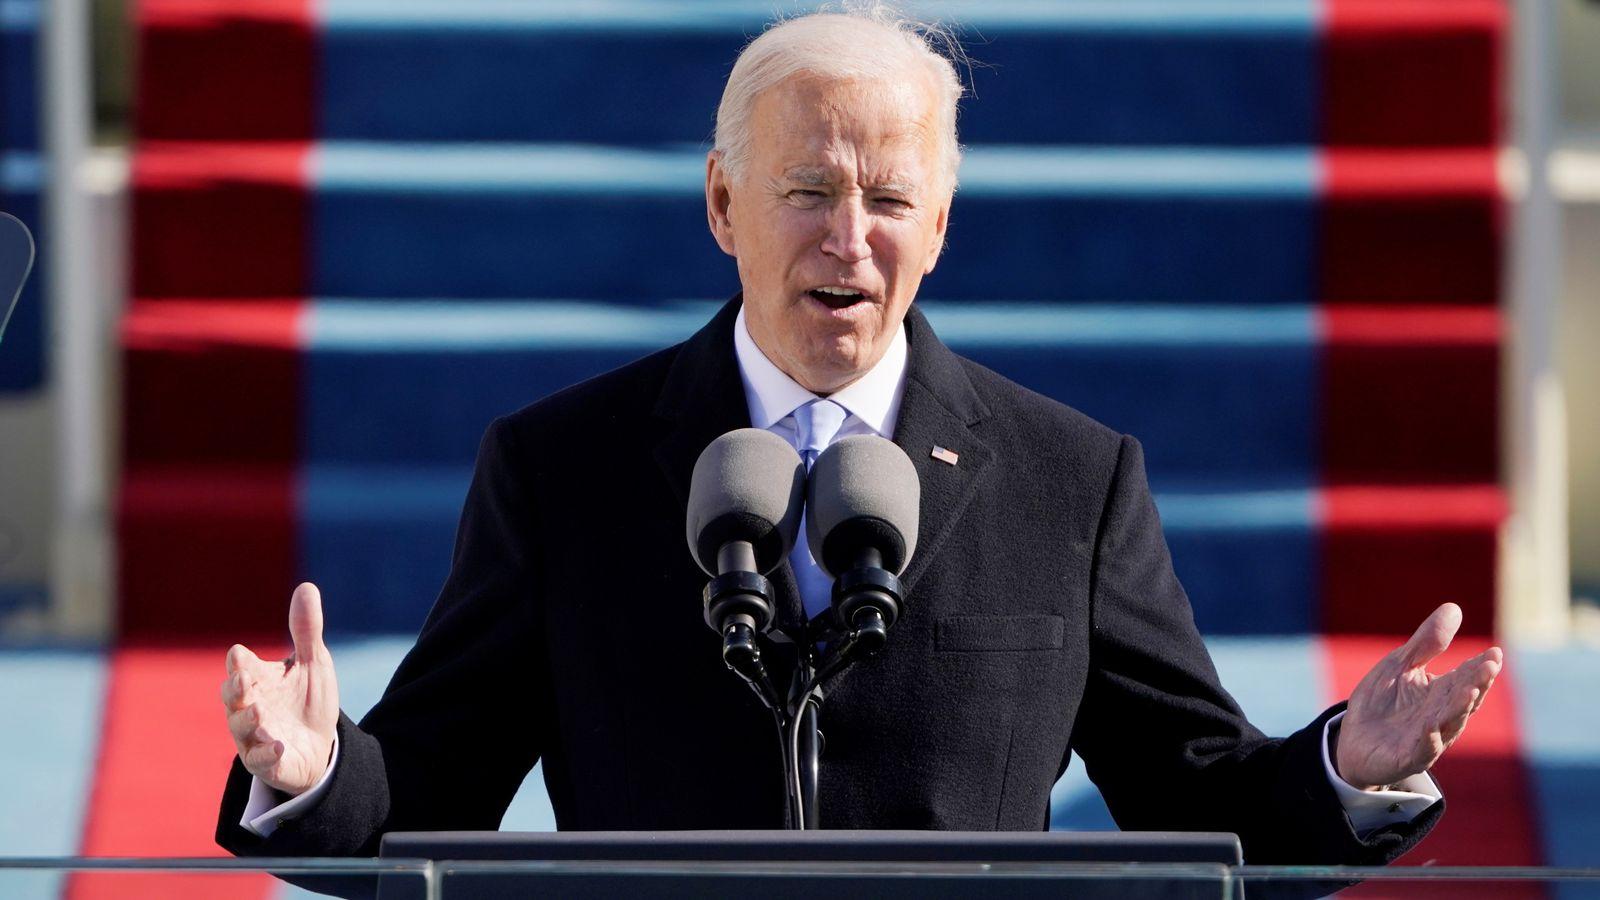 President of teh United States, Joe Biden. [PHOTO CREDIT: Twitter handle of Piers Morgan]